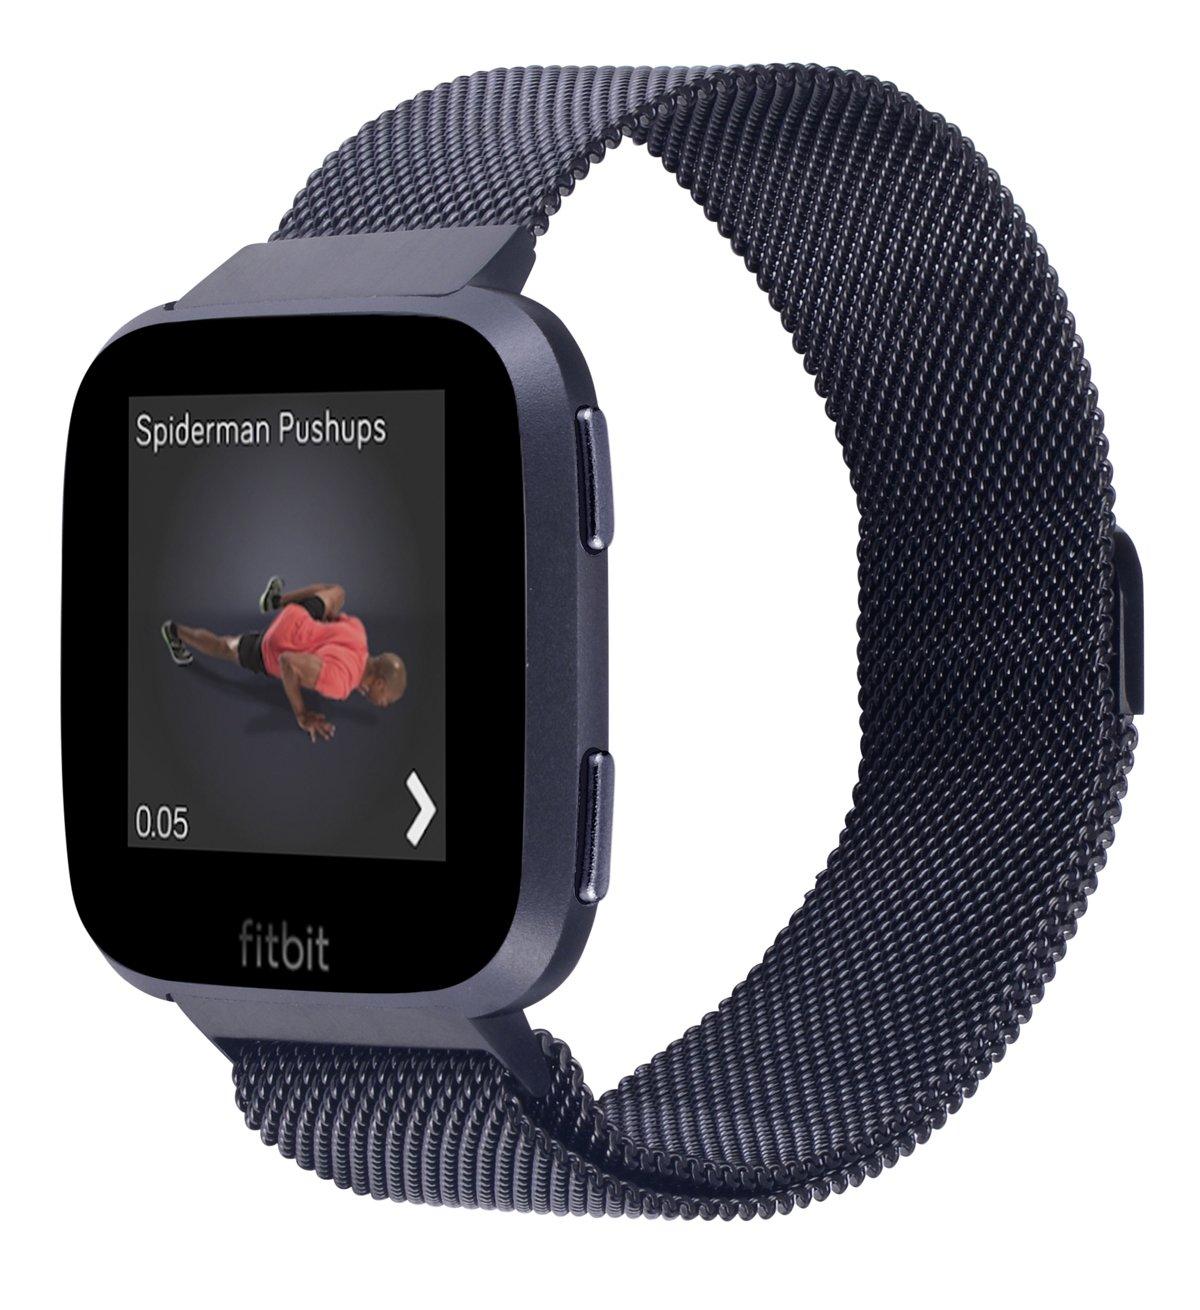 jsgjmy Apple Watchバンド38 mm 42 mmレディースメンズGenuineレザーループのiWatch Series 3 /シリーズ2 /シリーズ1 /Edition/スポーツ B07D5TMNDV ブラック Small Size:5.1\